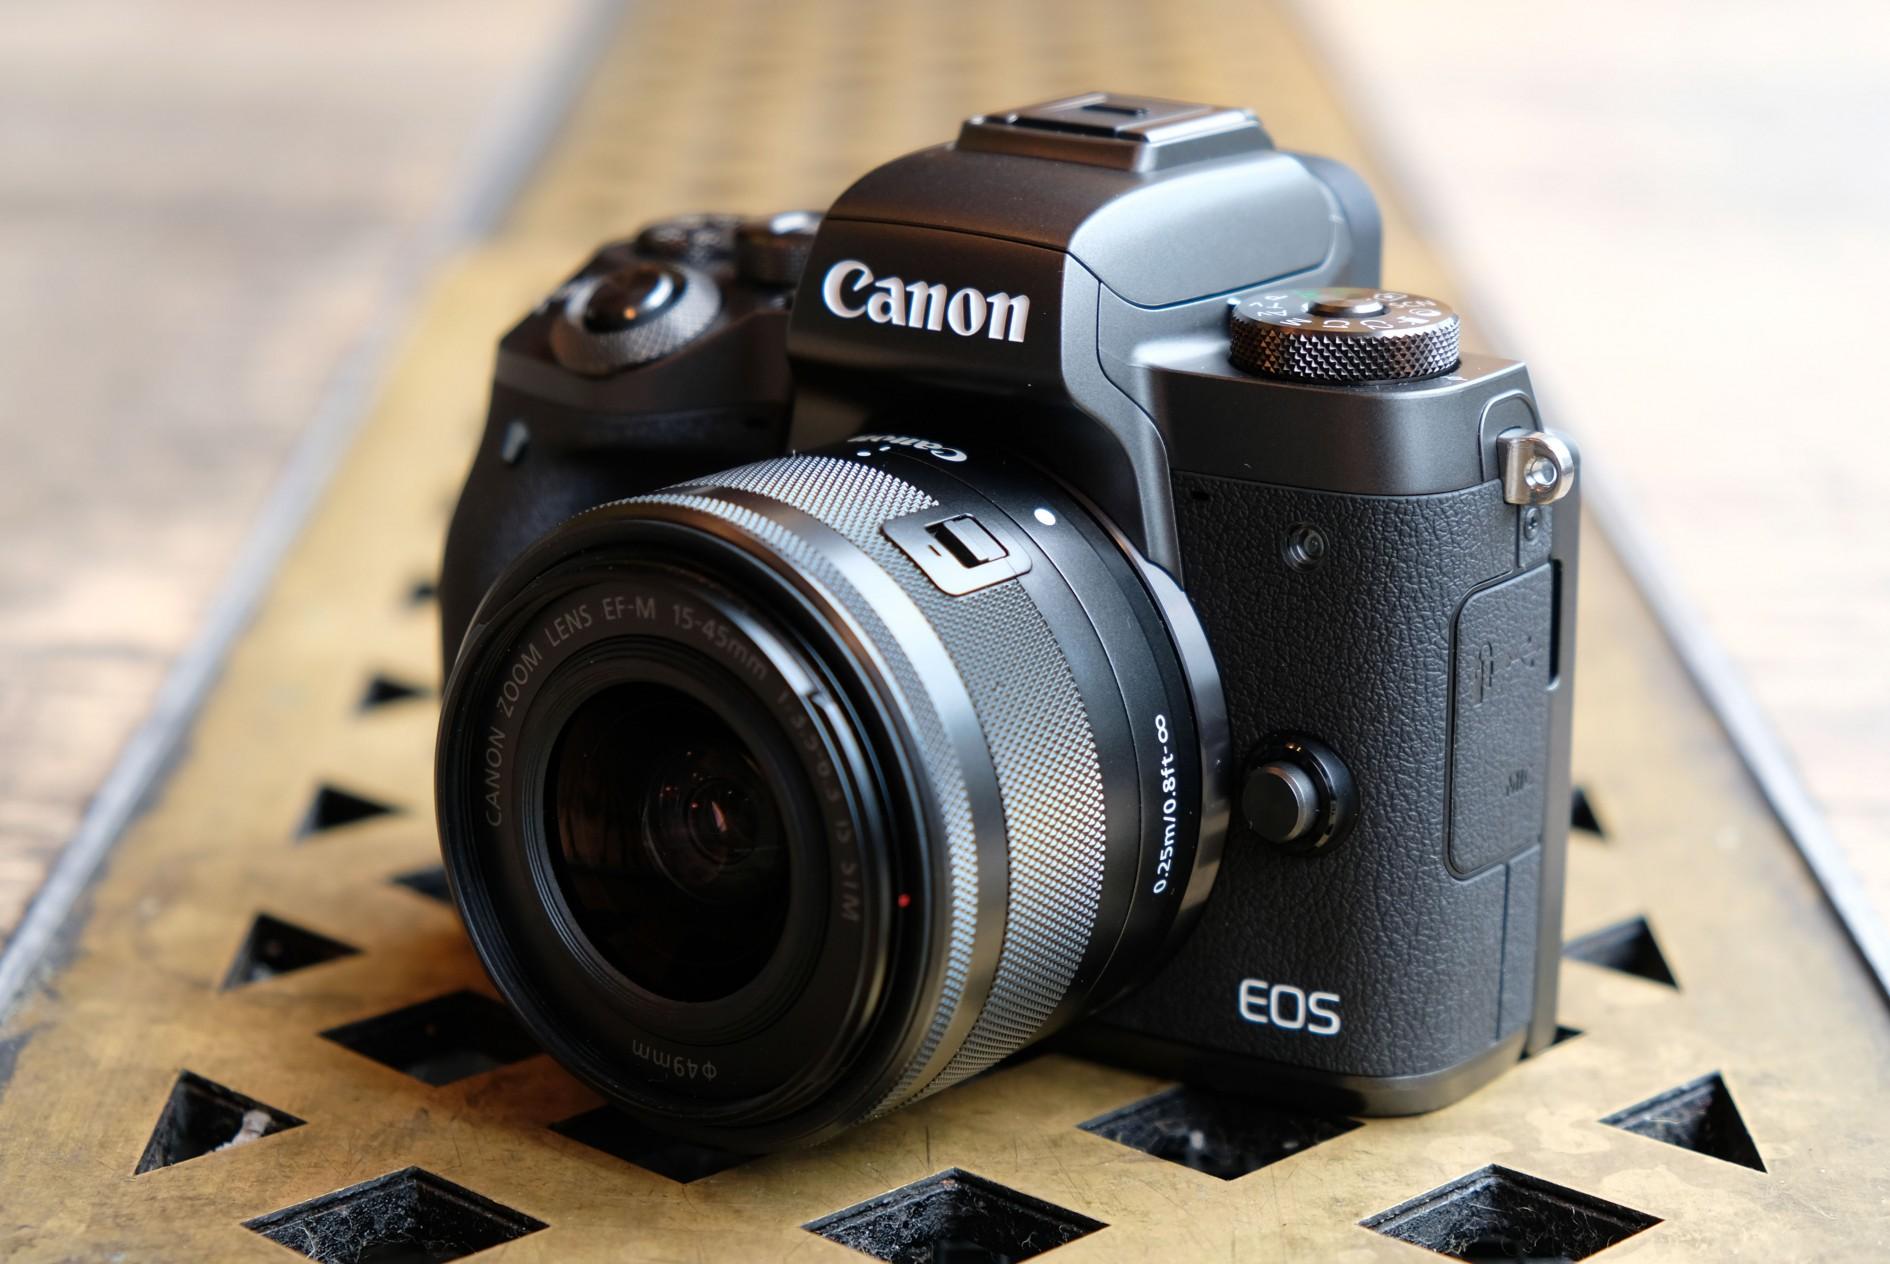 Canon Eos M50 Microless Camera Has 24 1 Megapixel Sensor